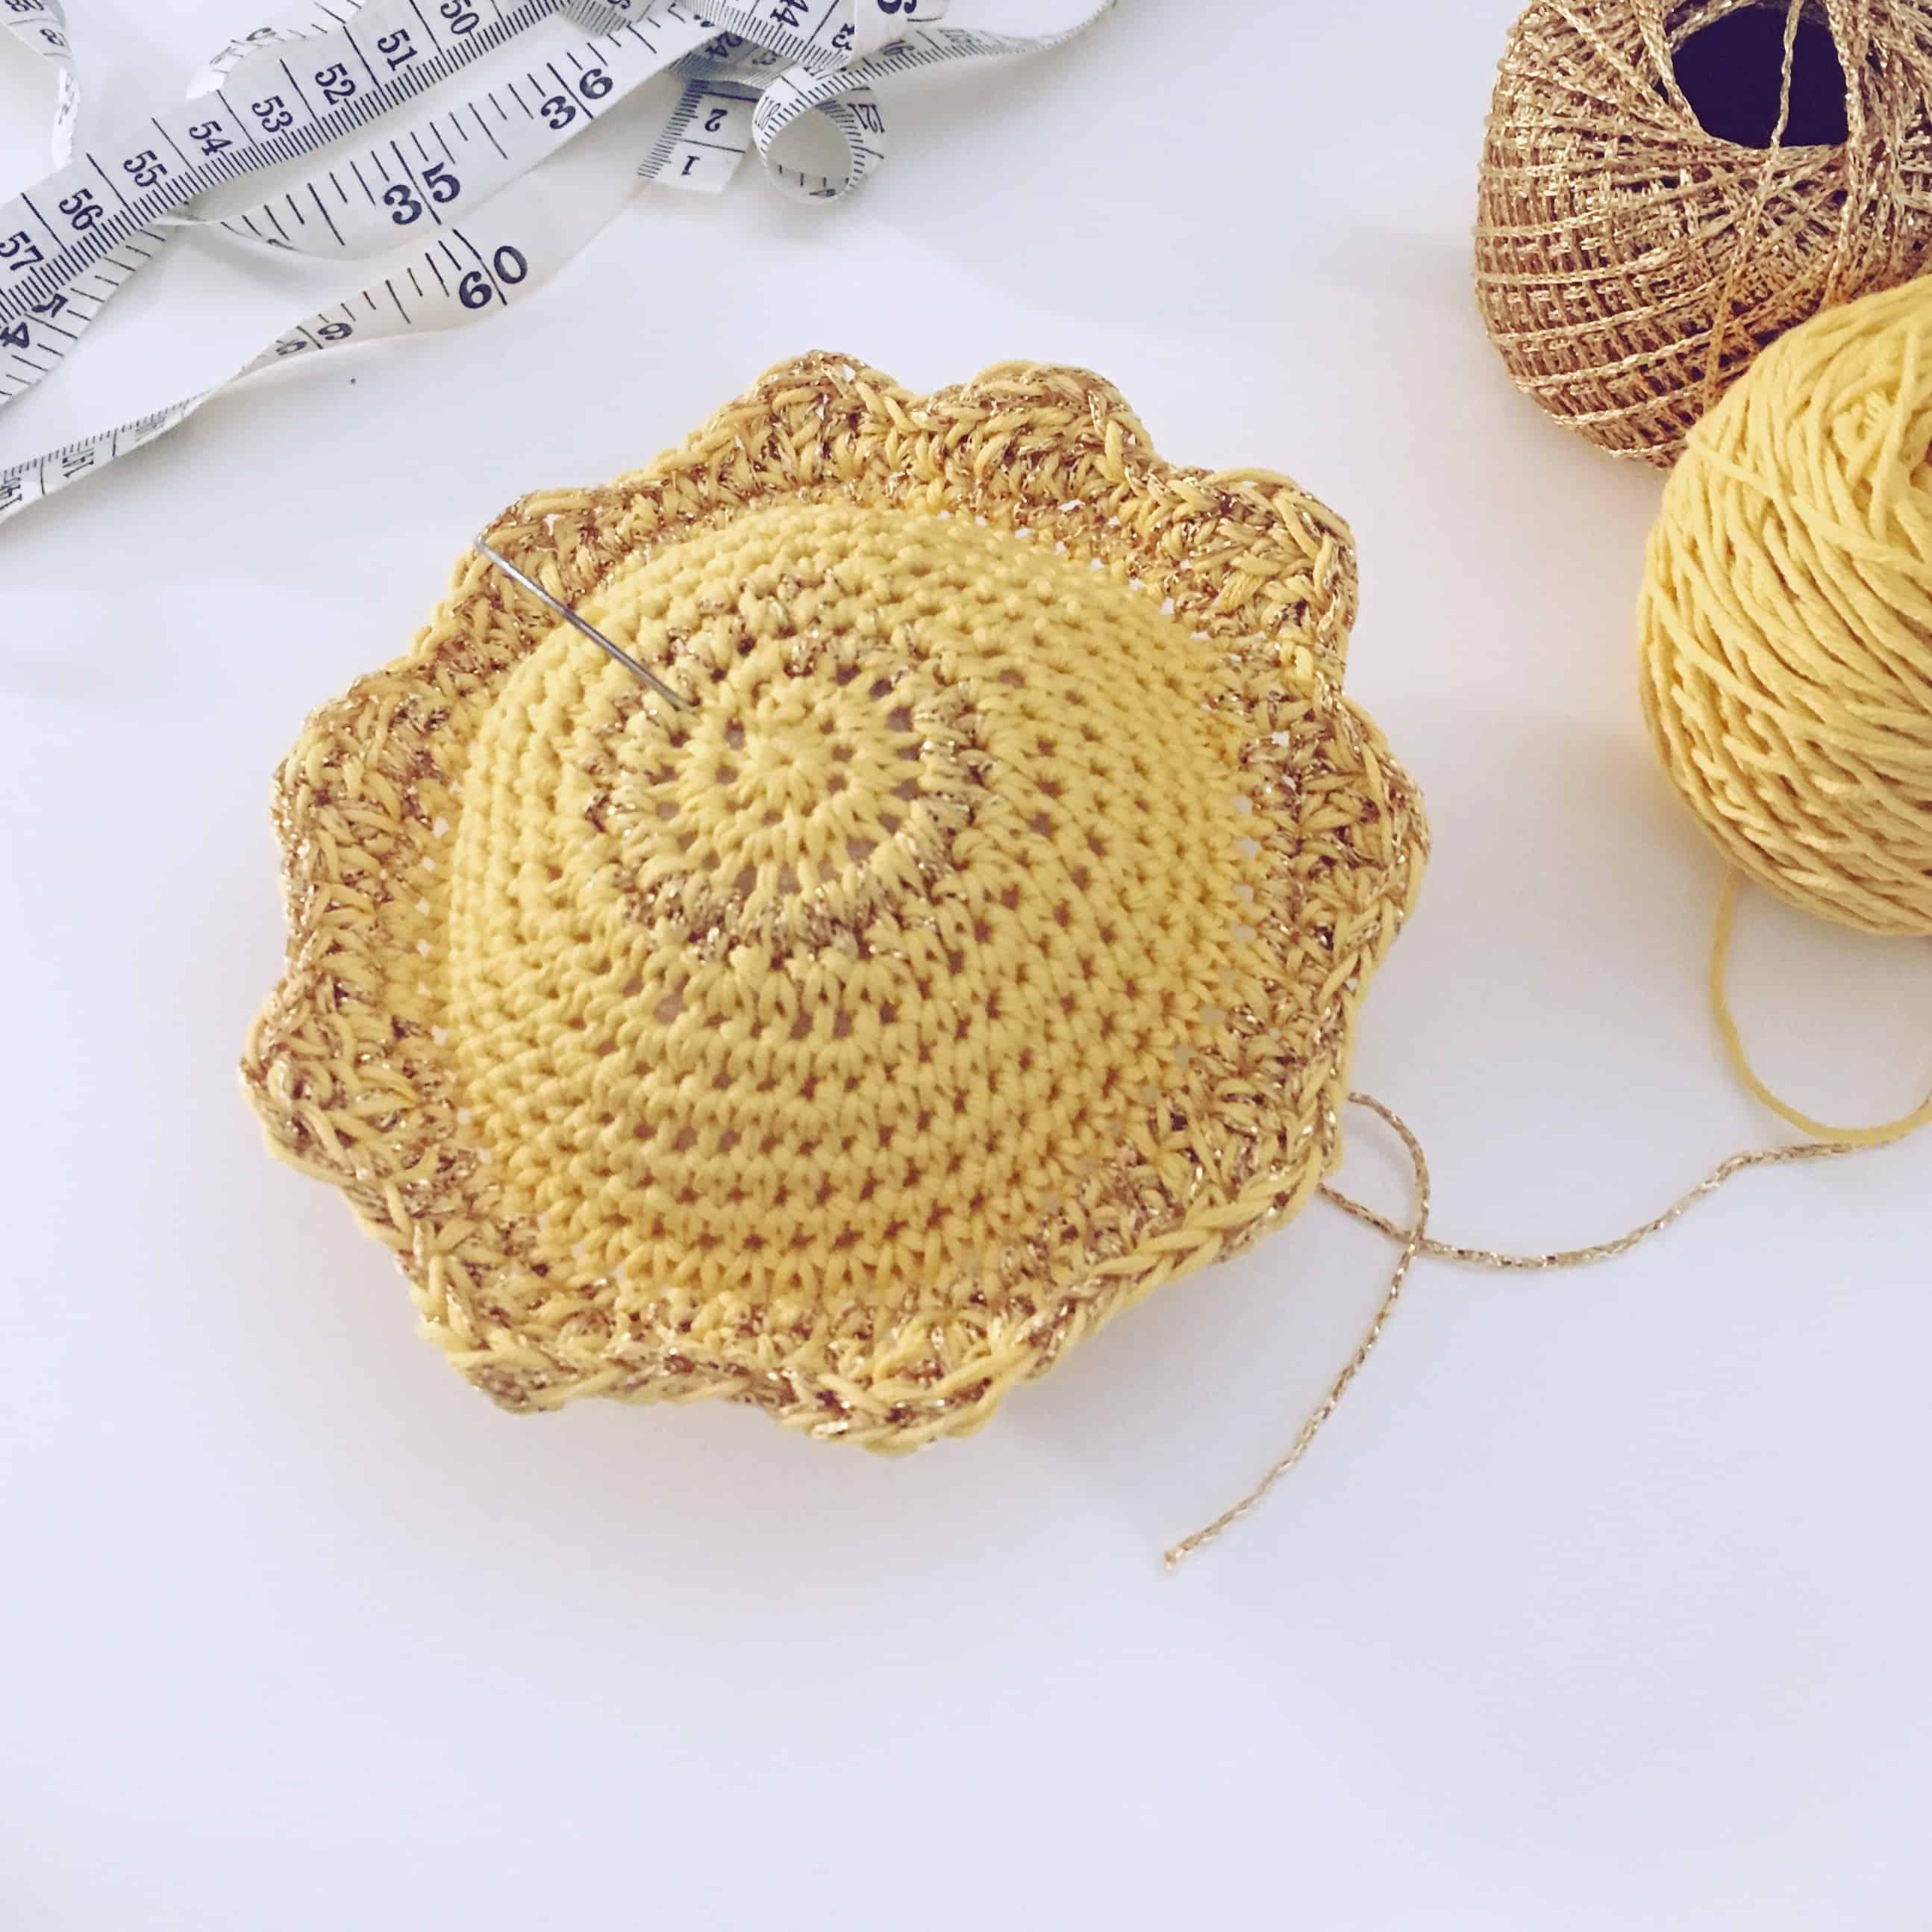 Pin me Sunshinecrochet pin-cushion by doradoes.co.uk